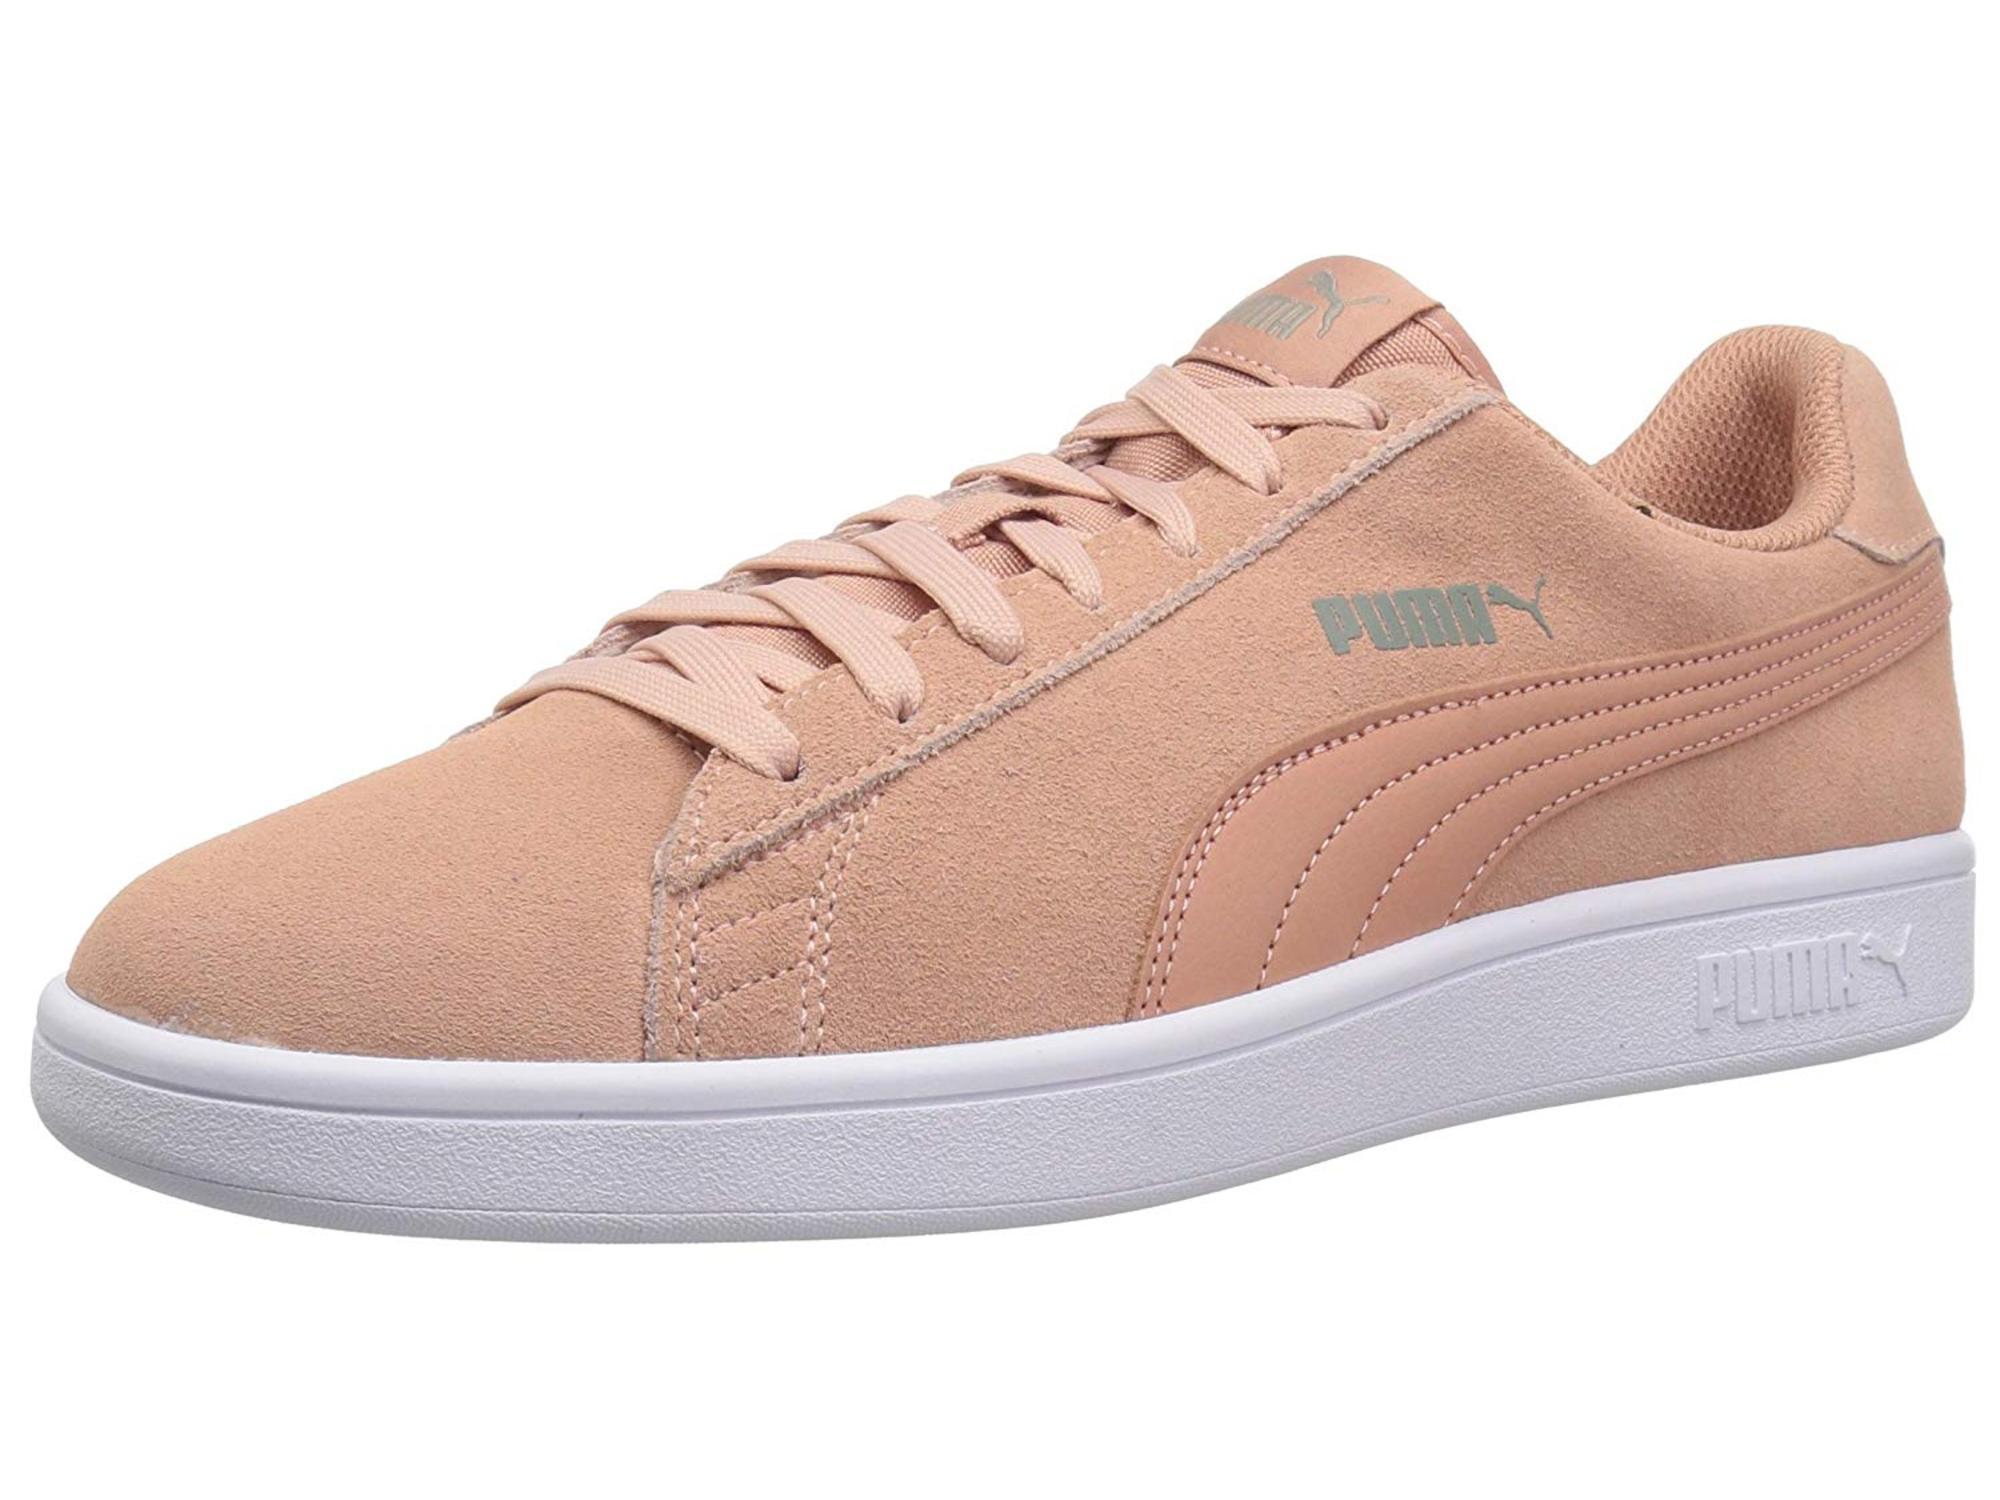 PUMA Men s Smash V2 Sneaker 51b4450d7